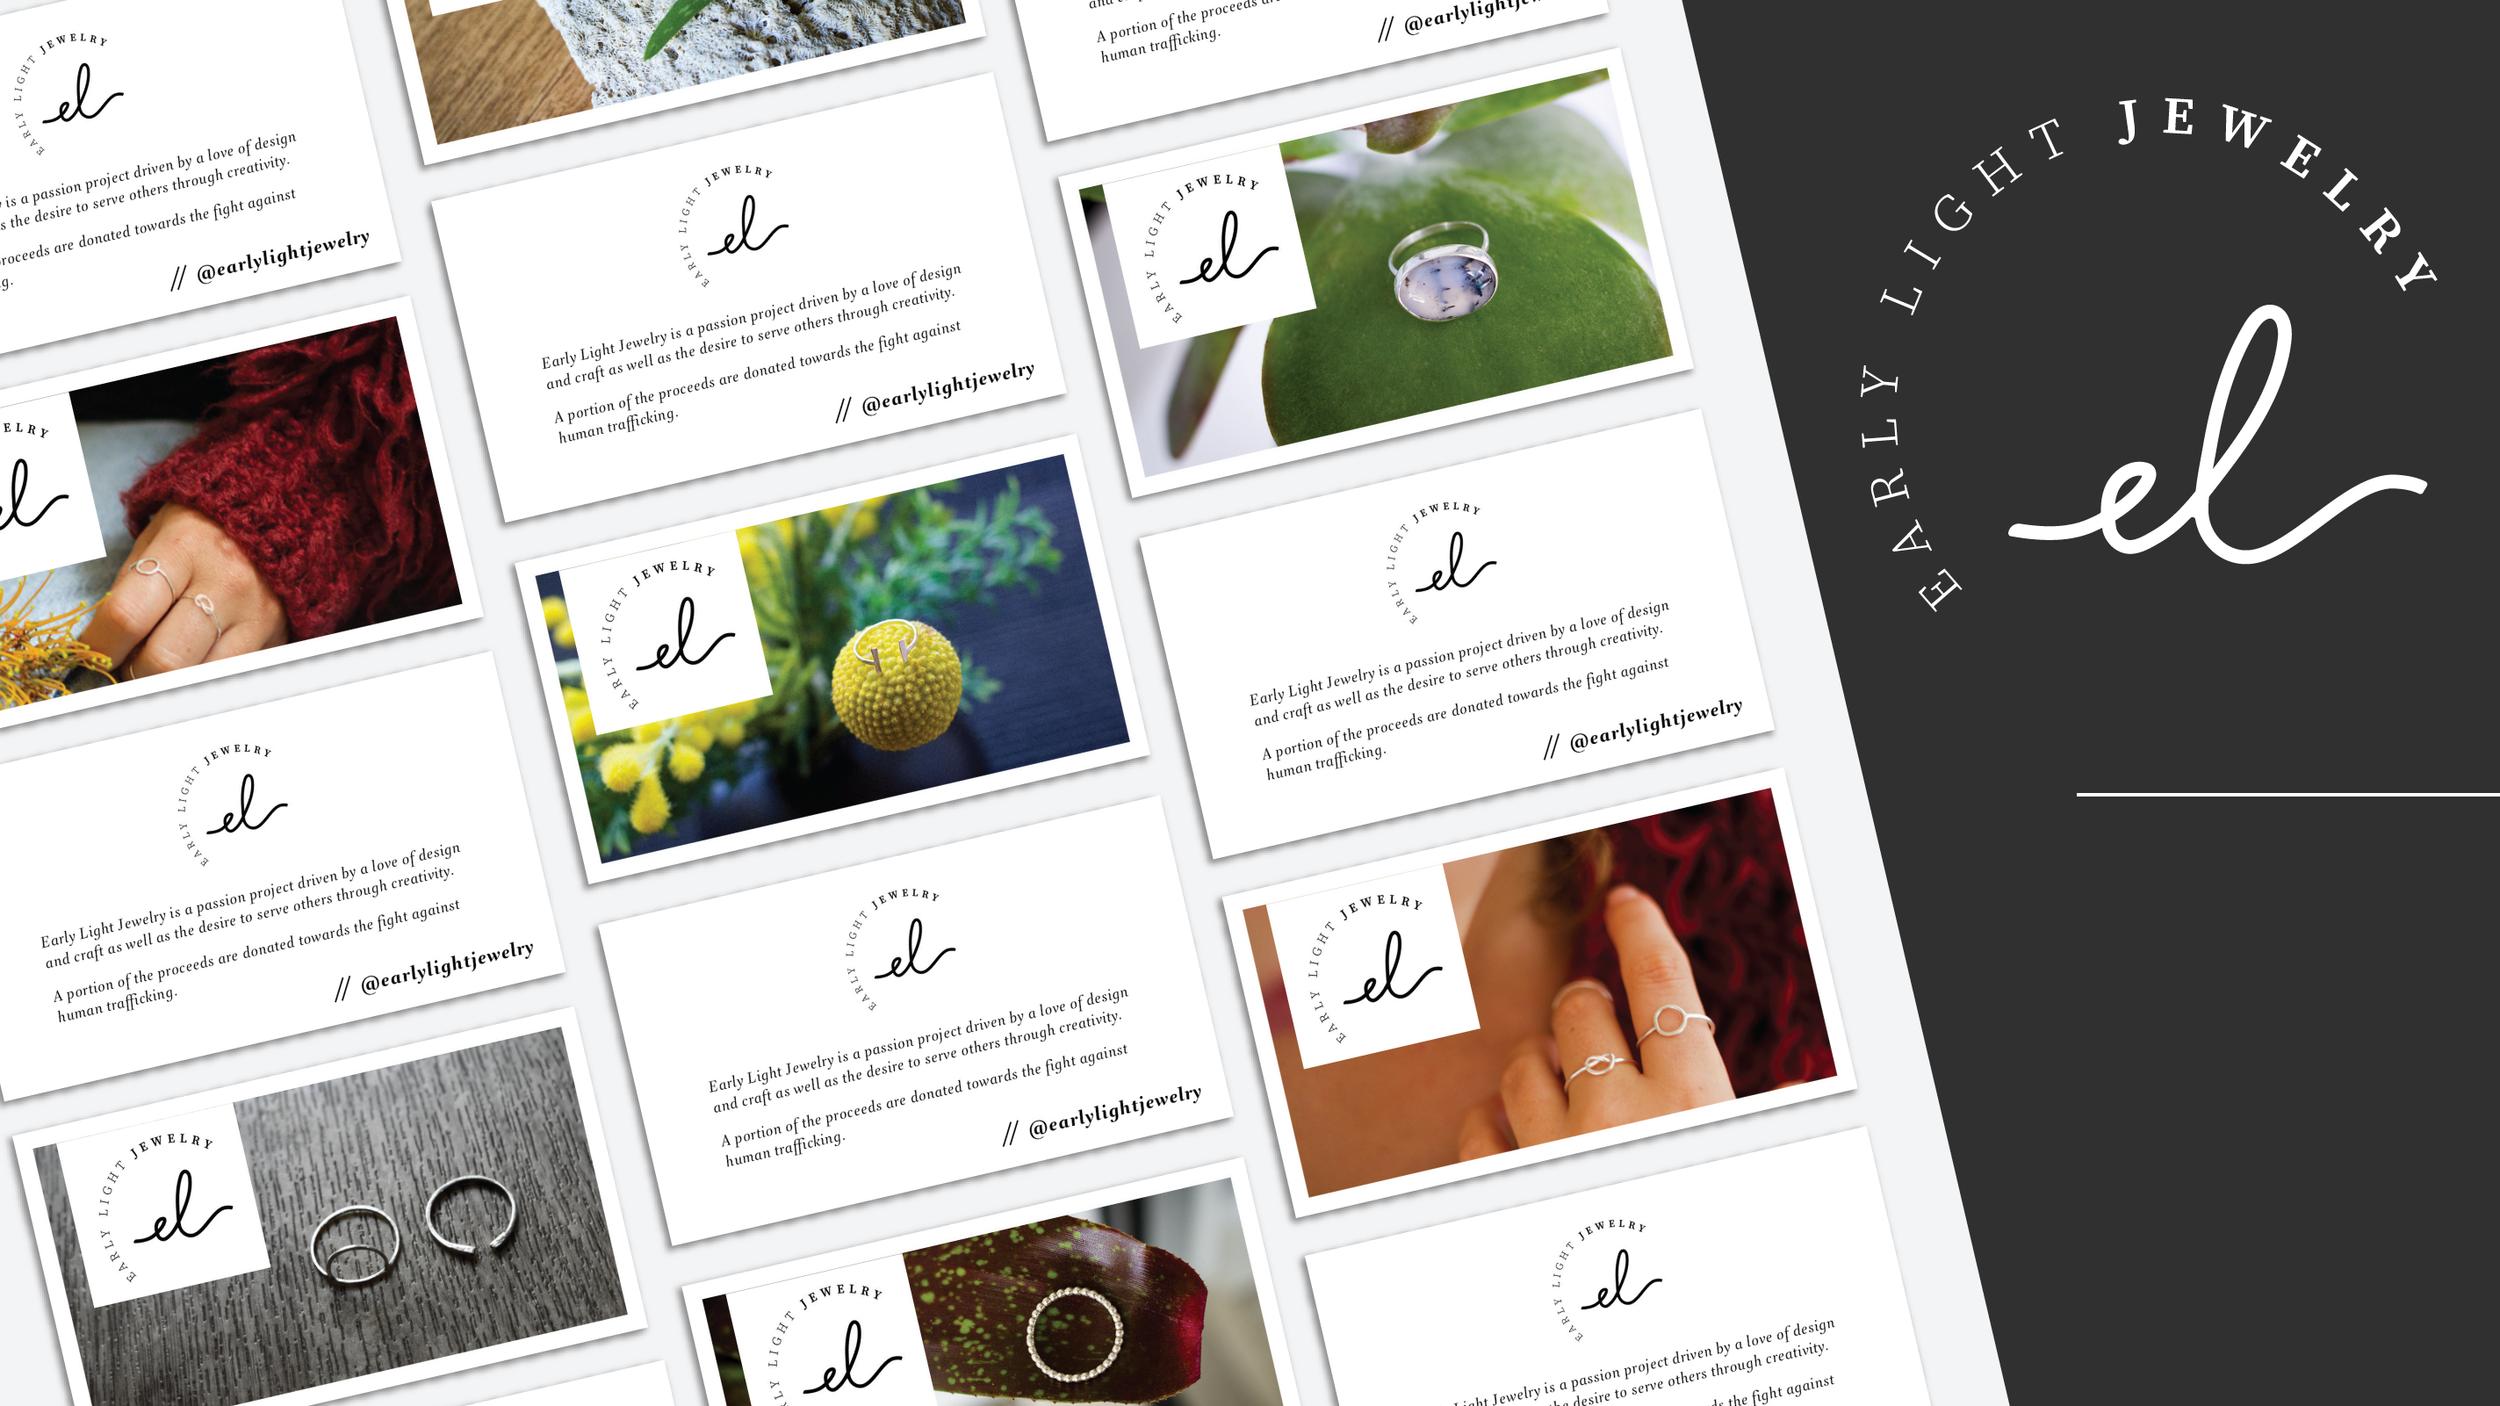 e_l_website_layout-05.png